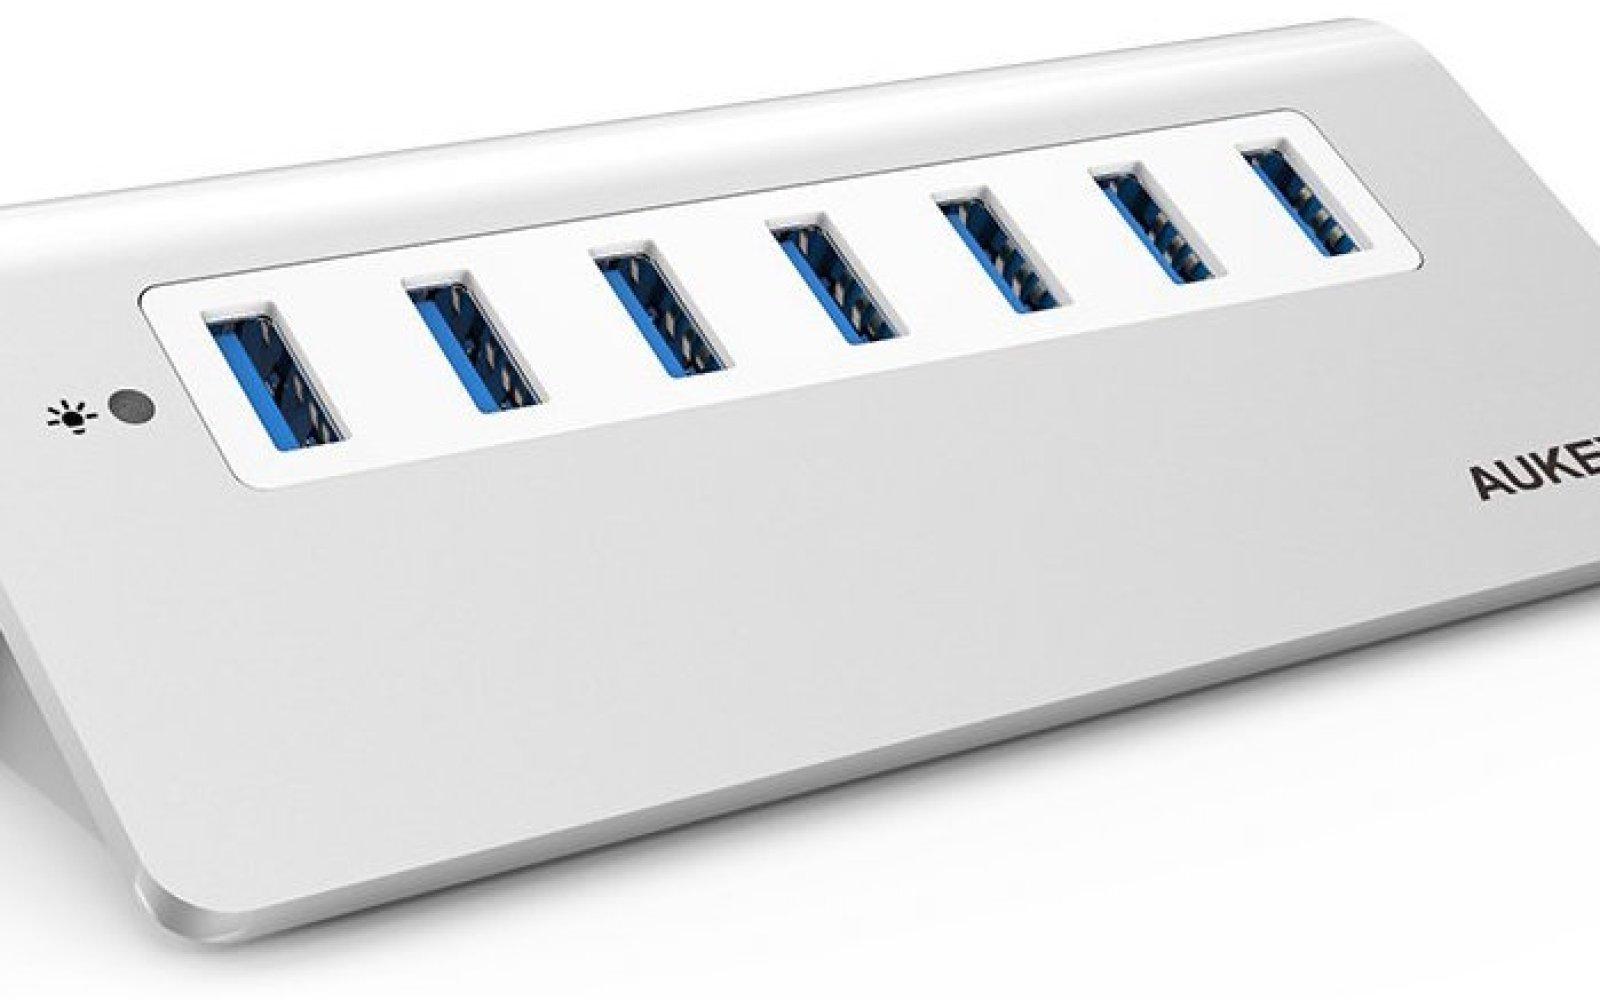 Aukey Aluminum 7x USB 3 portable 30W powered hub: $30 Prime shipped